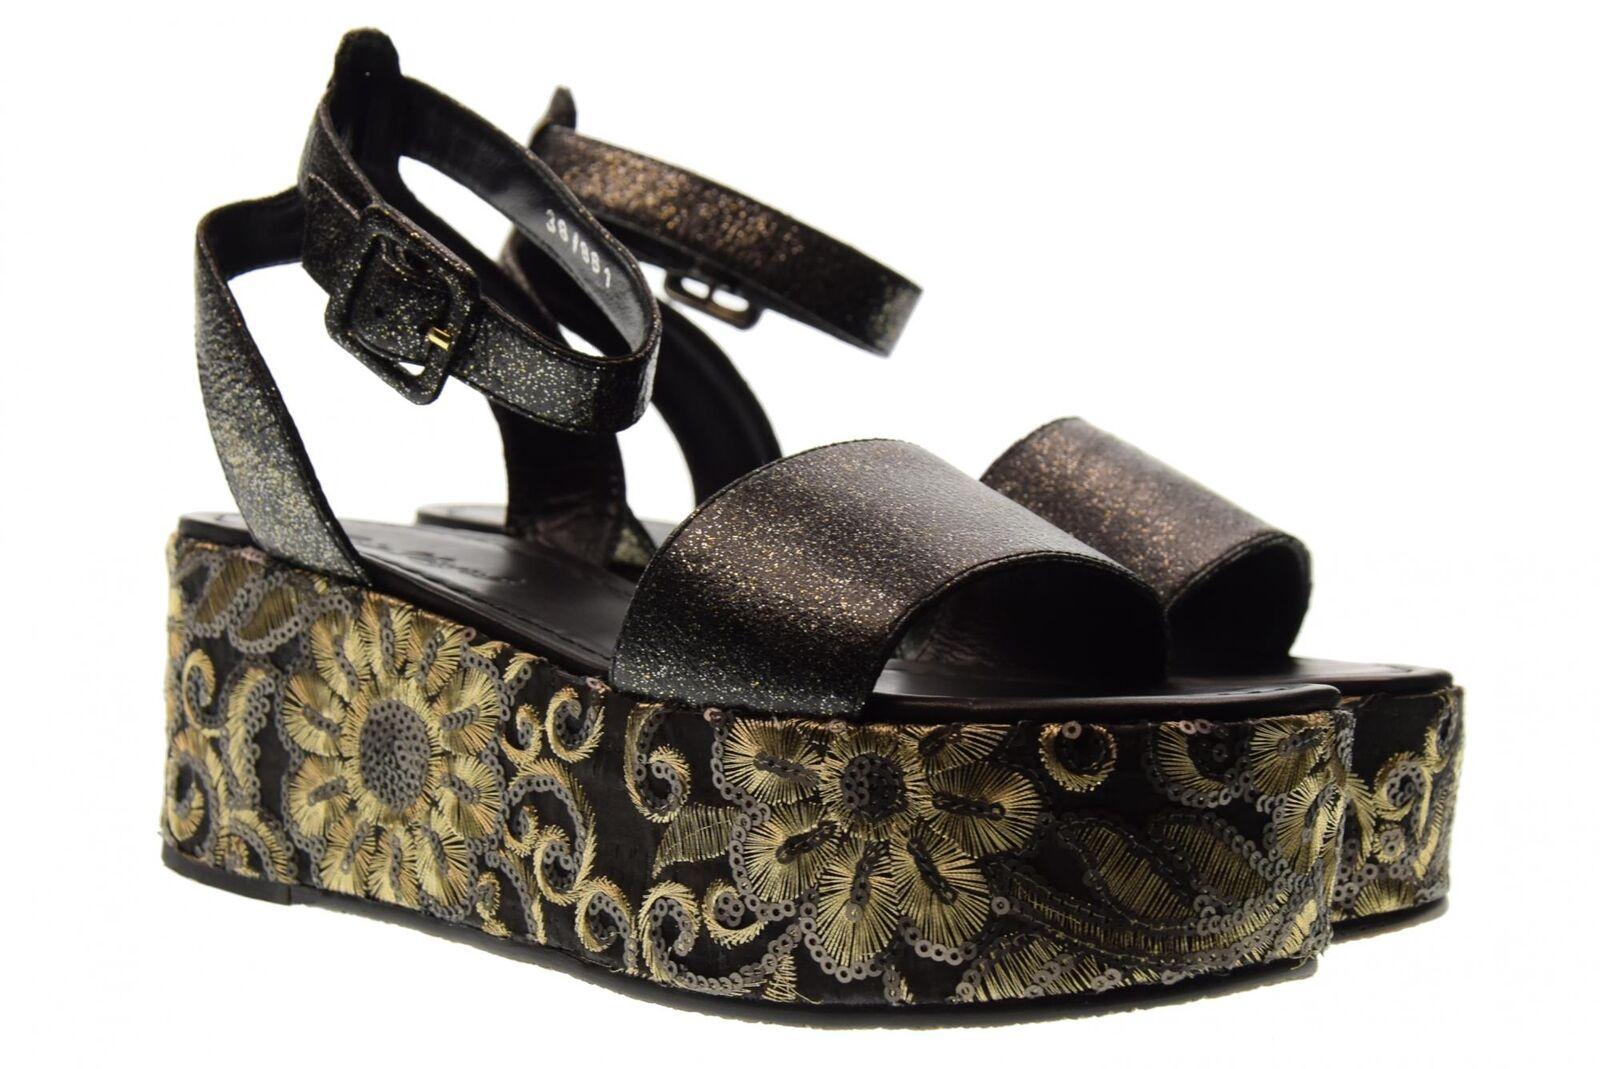 Cris Vergre' Schuhe Frau Sandalen H0802X SCHWARZ SCHWARZ SCHWARZ P18g 3c2010